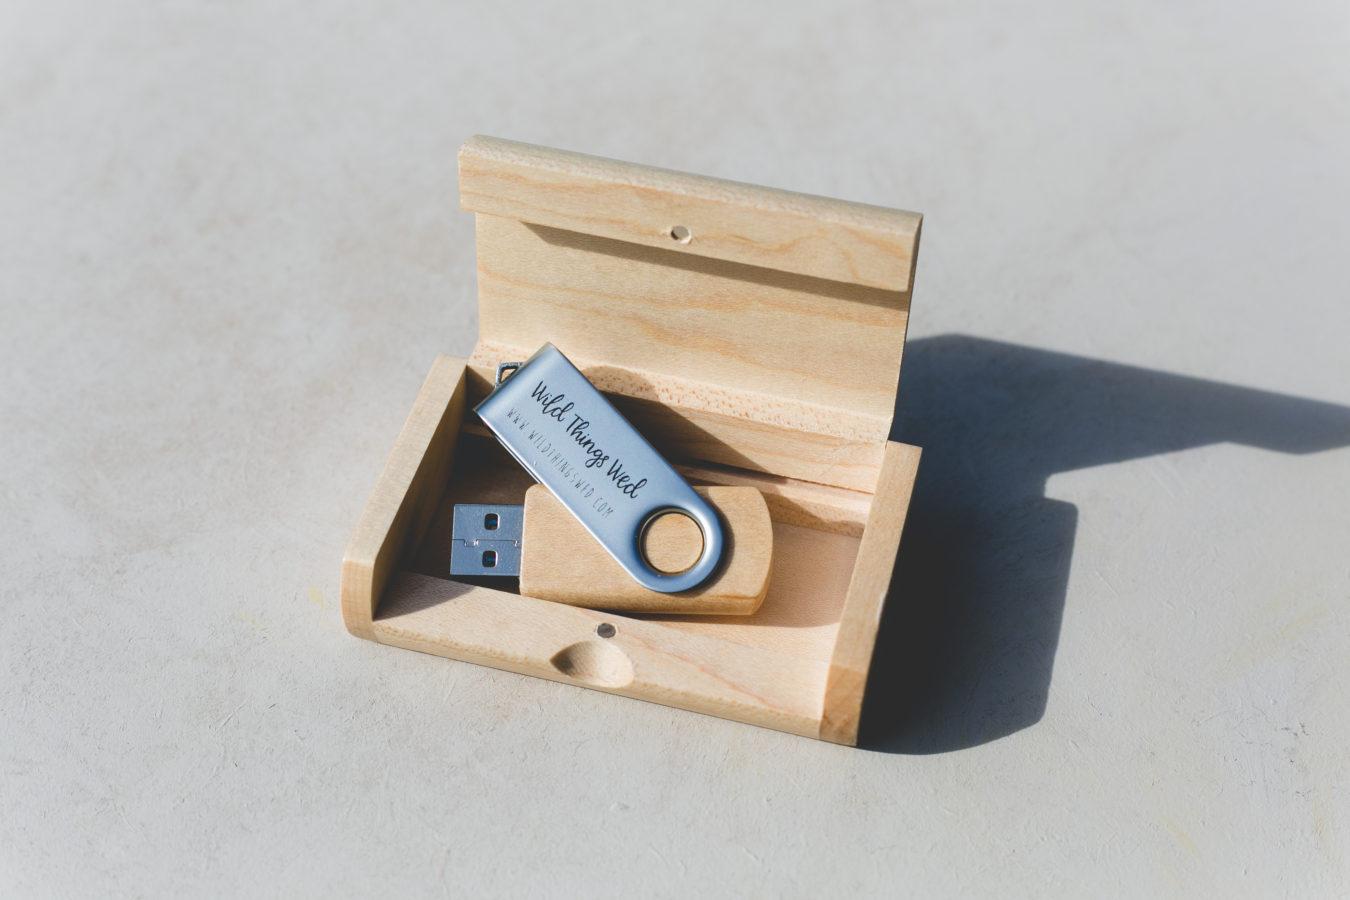 USBs and Branding-3